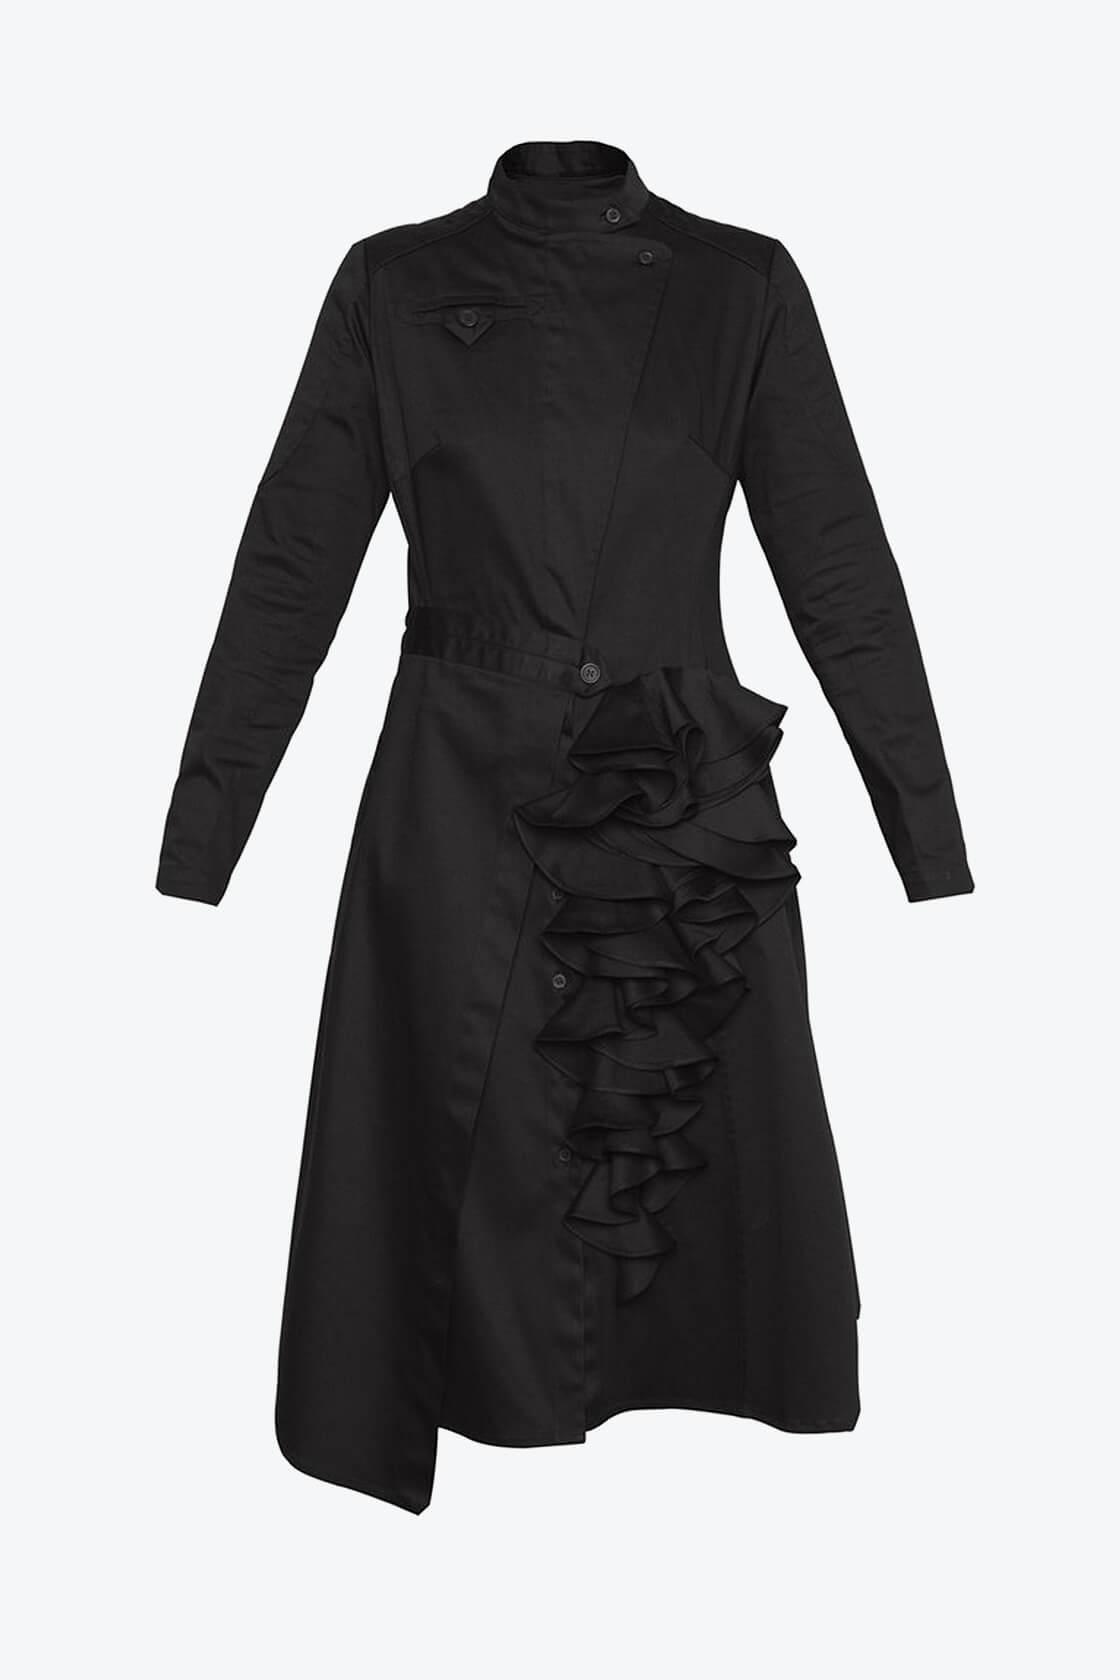 OL10000205 Asymmetric biker dress black1